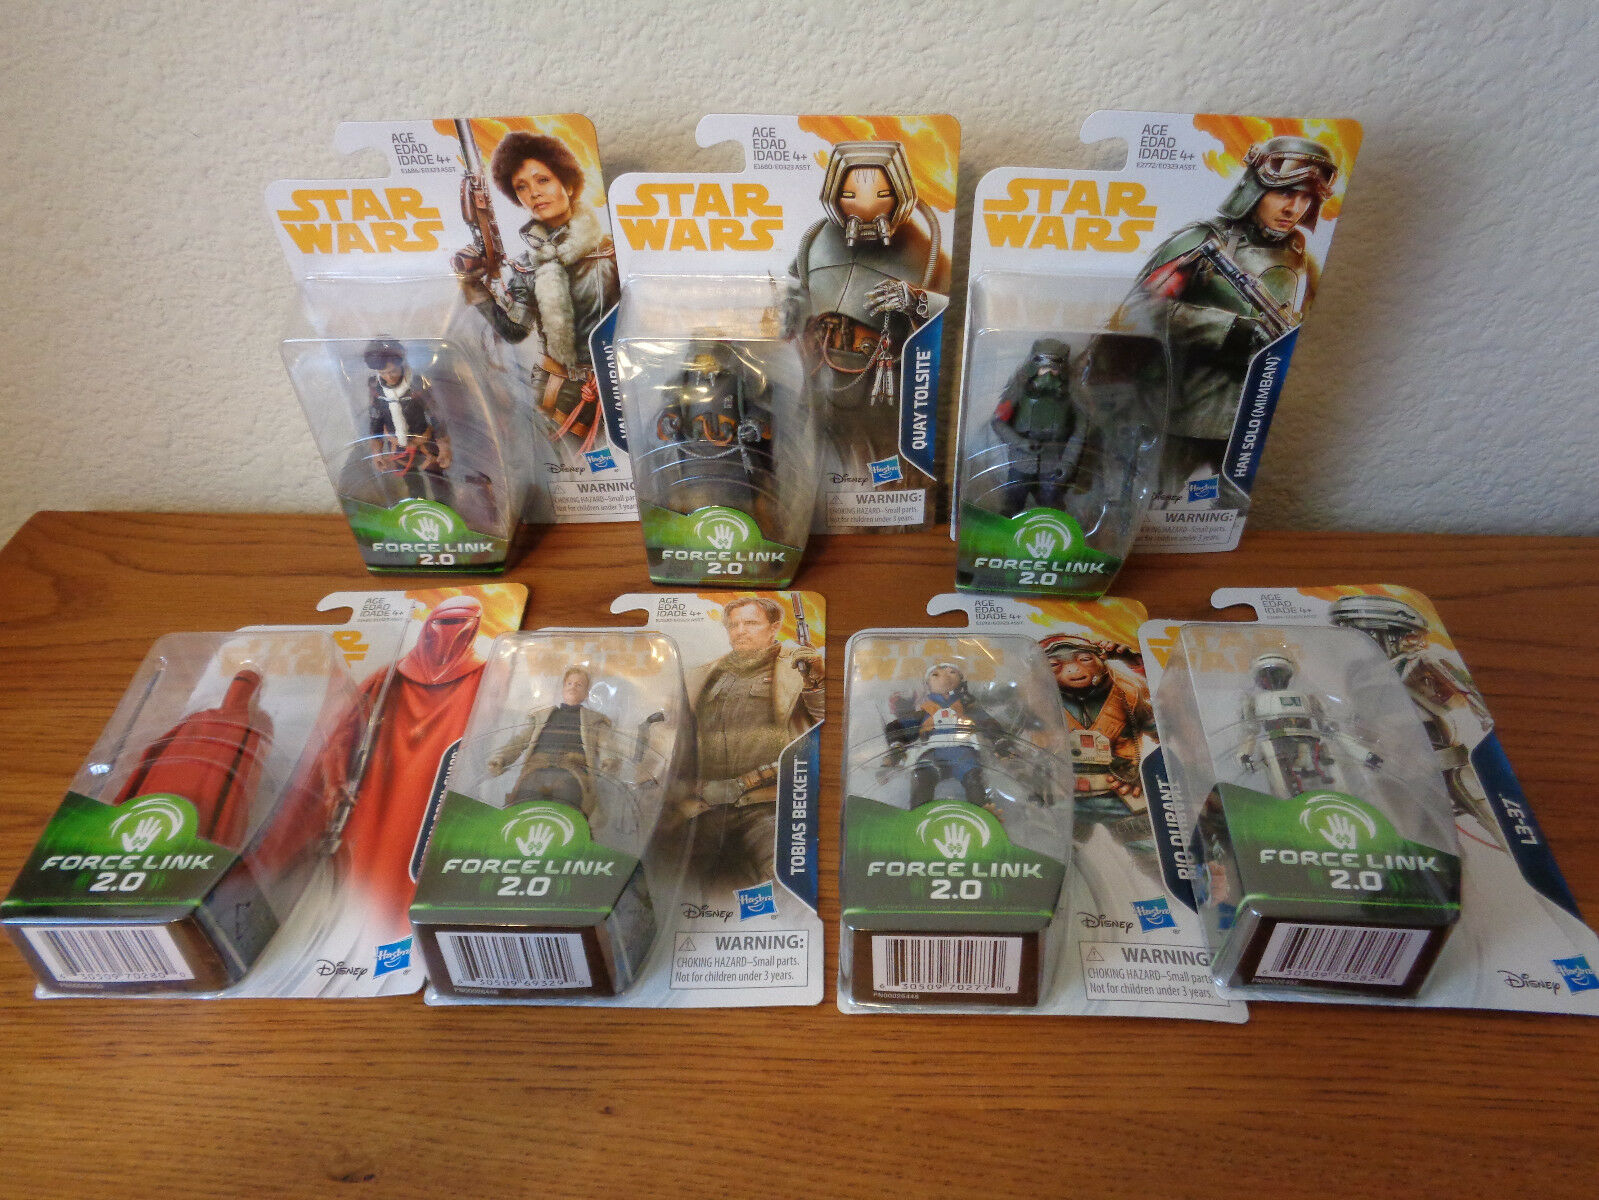 Star Wars 3.75 Solo Wave 4 Set TOBIAS VAL RIO DURANT L3-37 ROYAL GUARD IN STOCK Film, telewizja i gry wideo Figurki akcji i z filmów